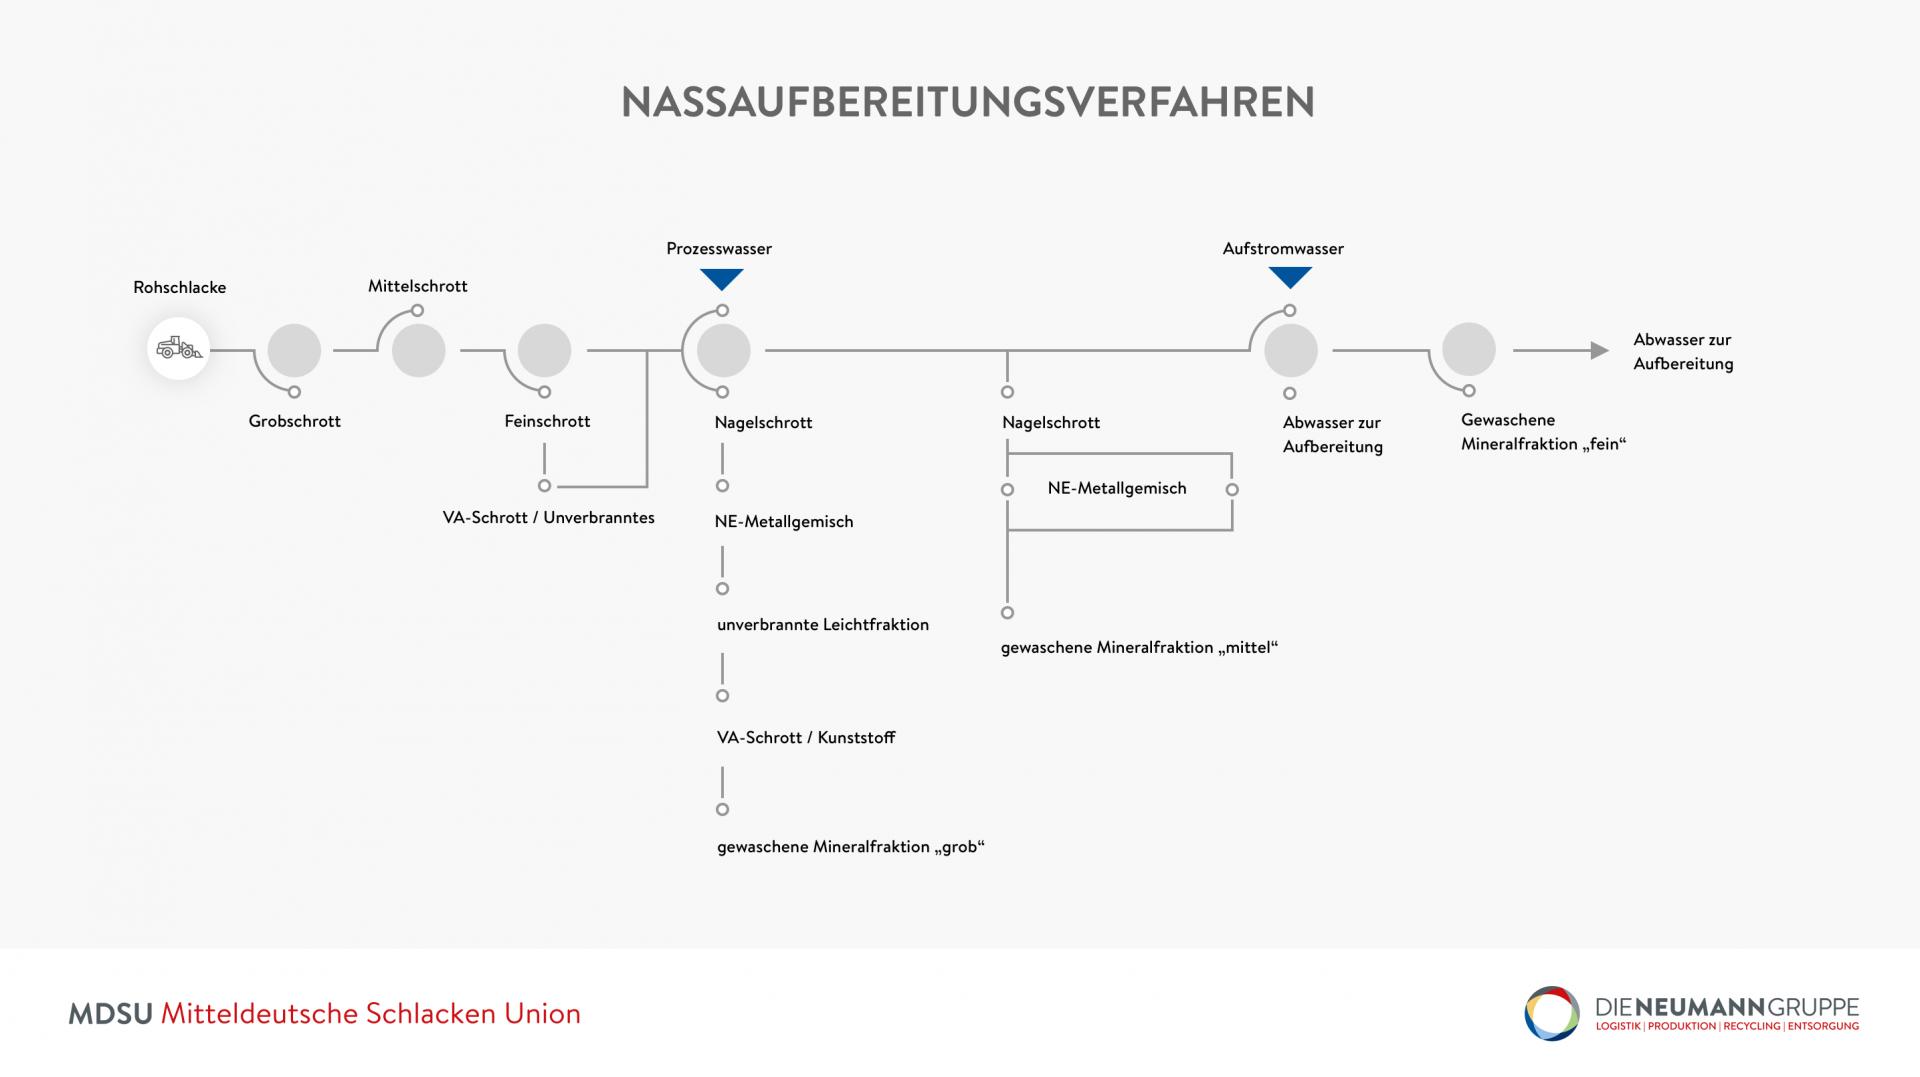 Abbildung MDSU Nassaufbereitung Schema